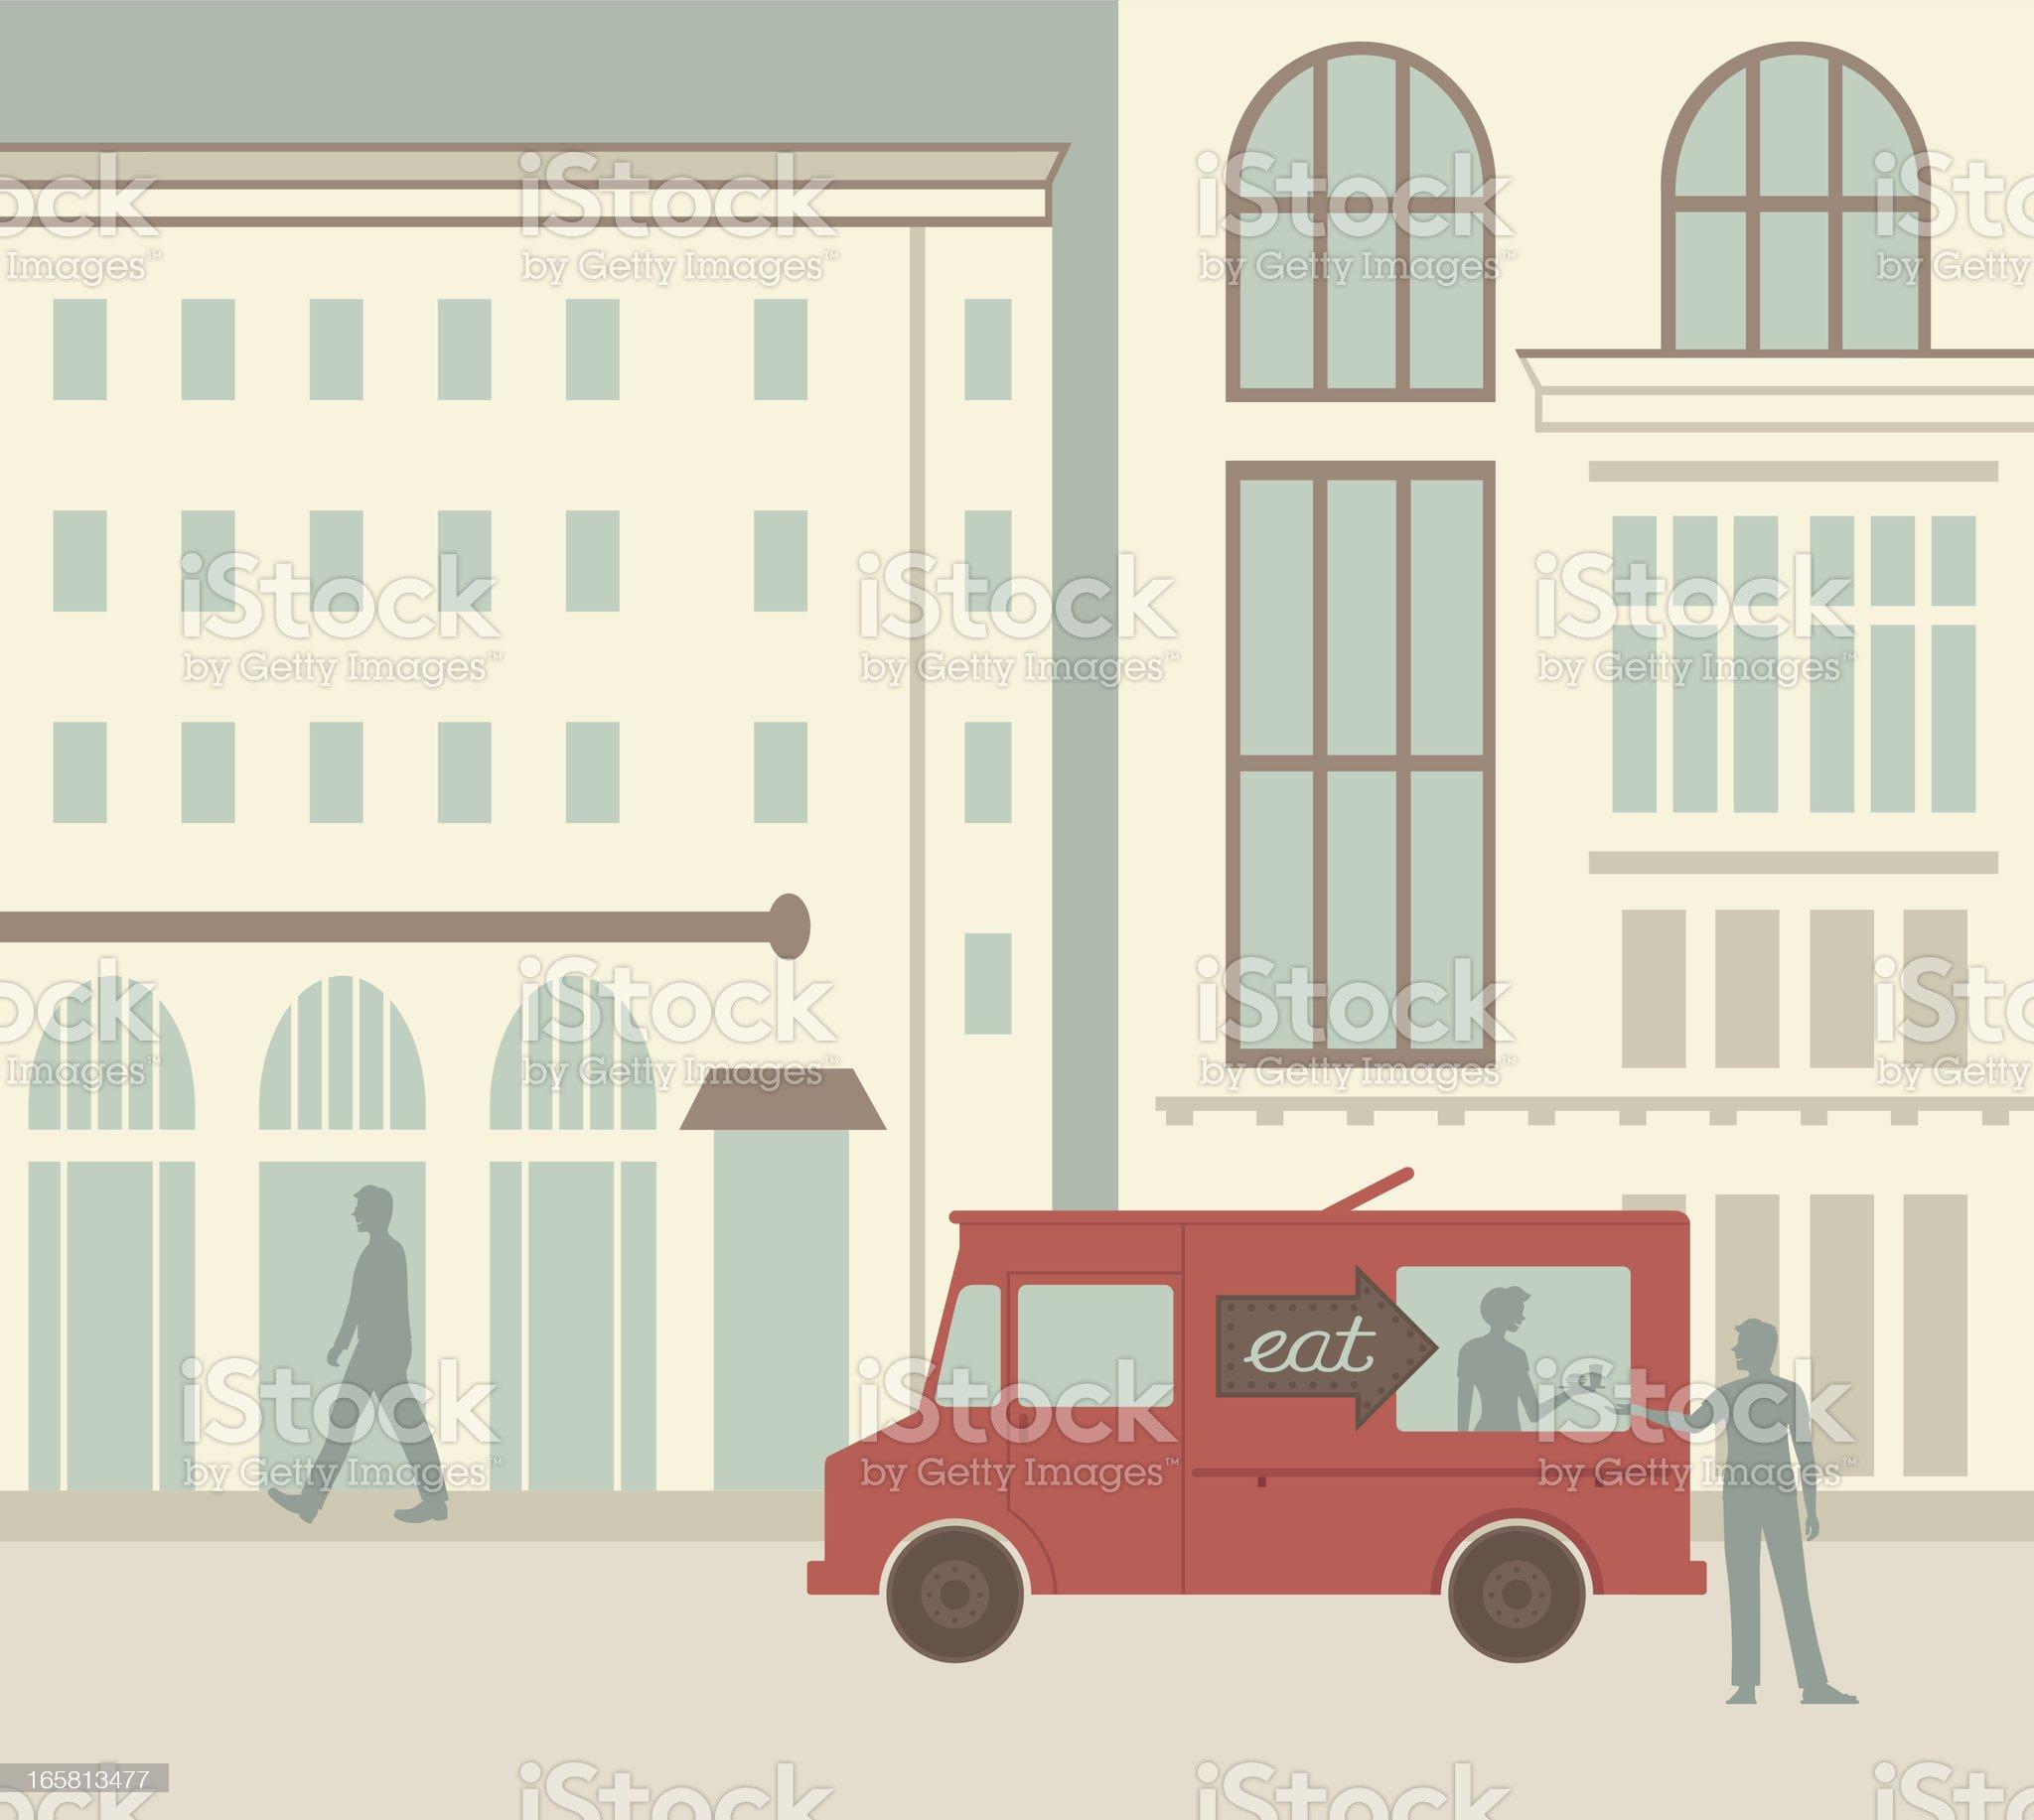 City Food Truck royalty-free stock vector art